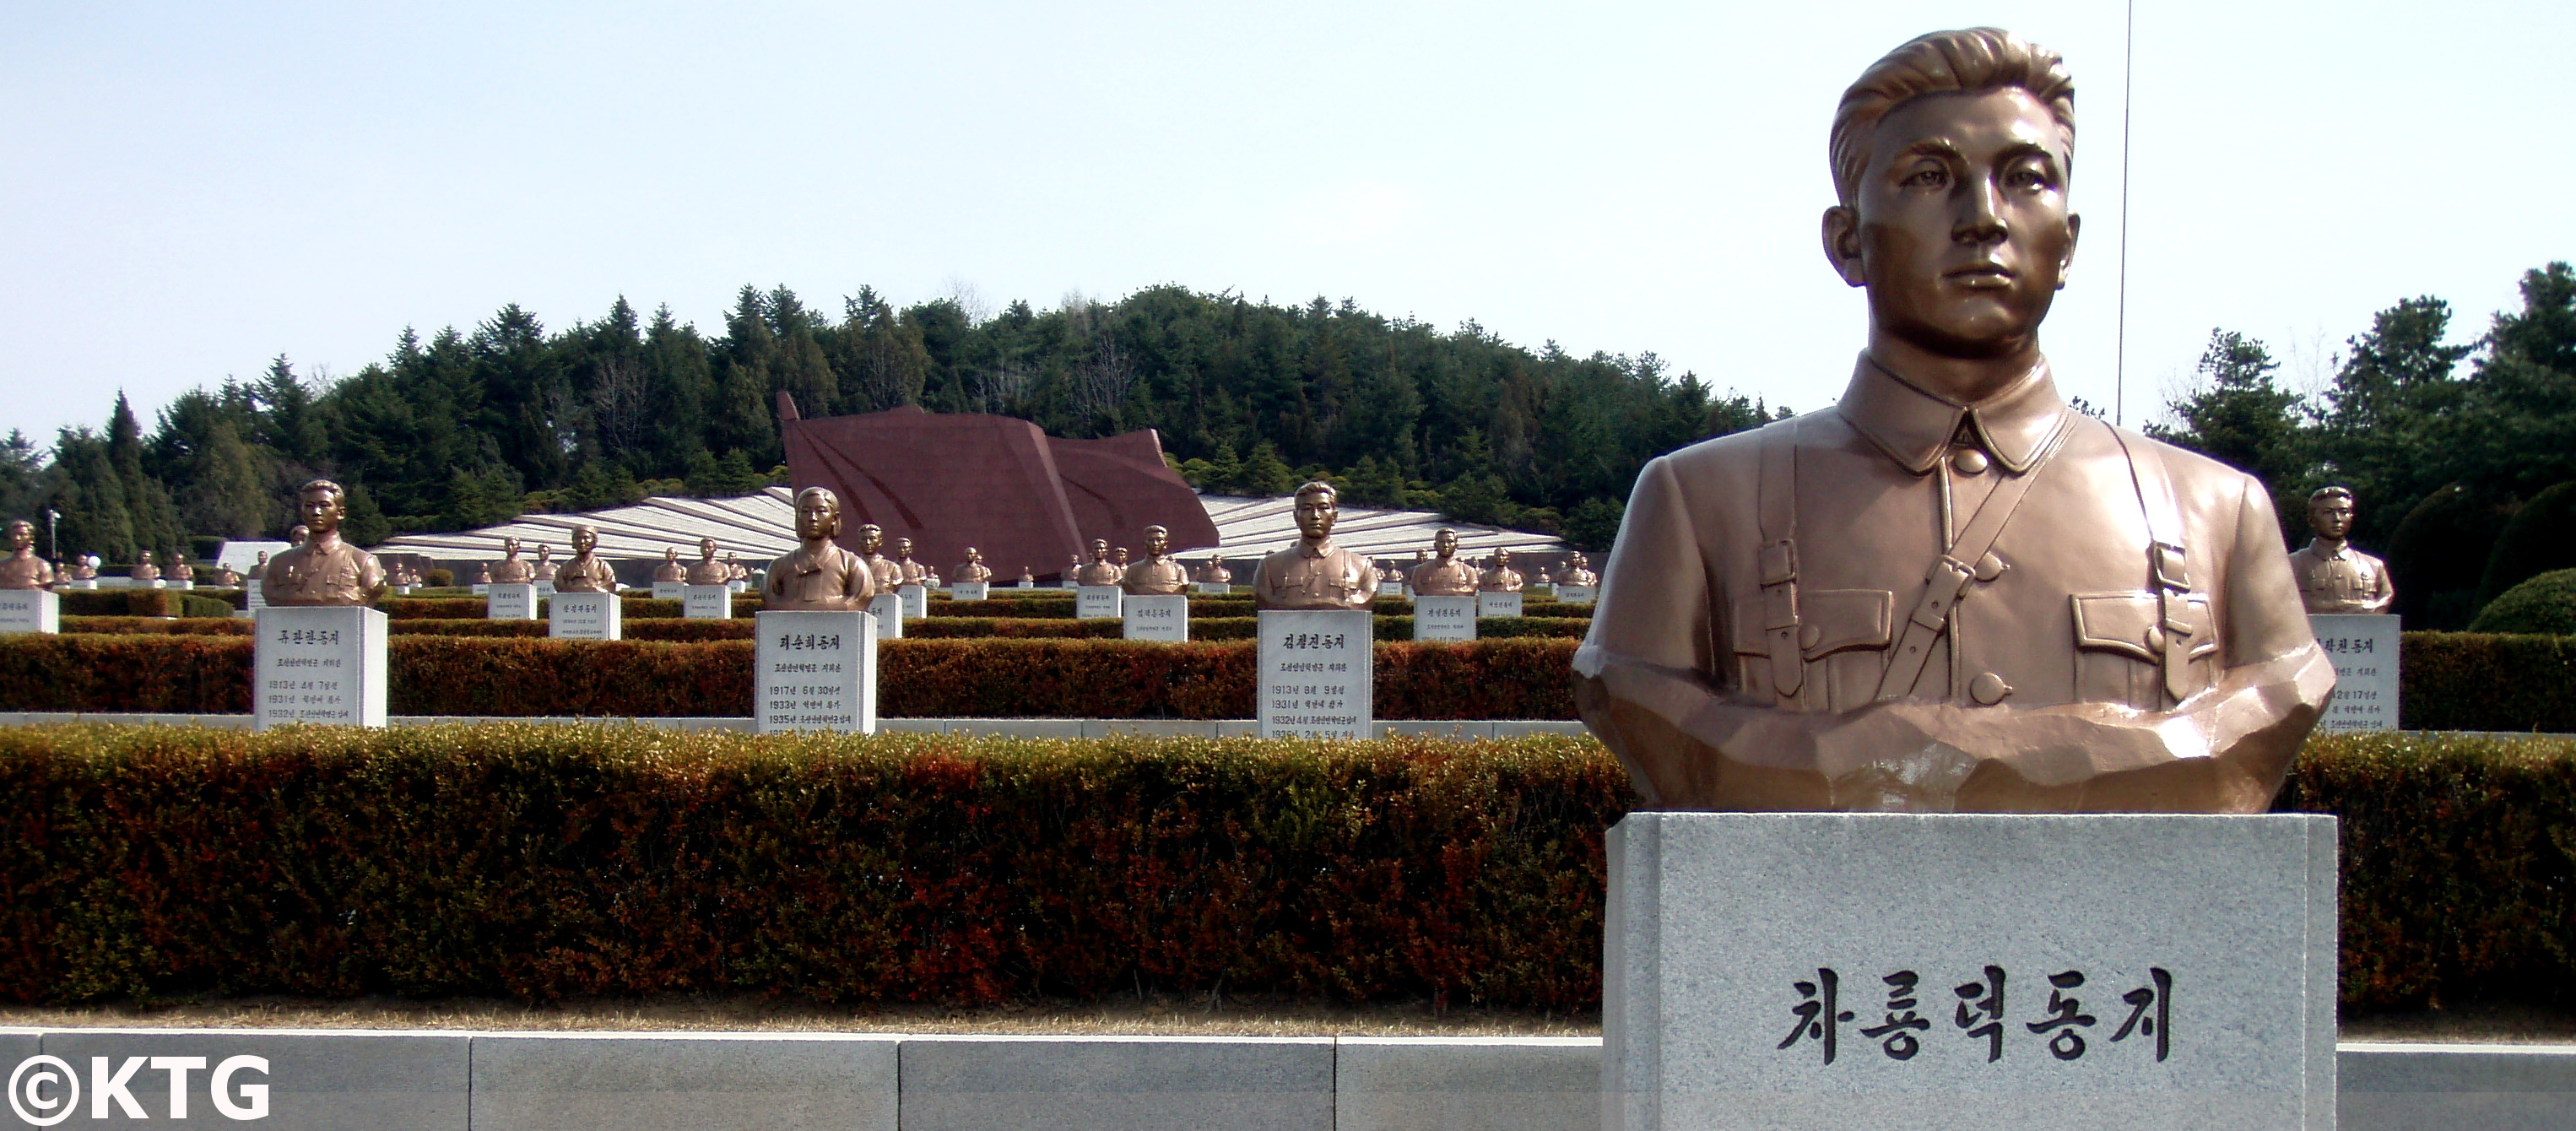 Friedhof der Revolutionshelden Nordkorea